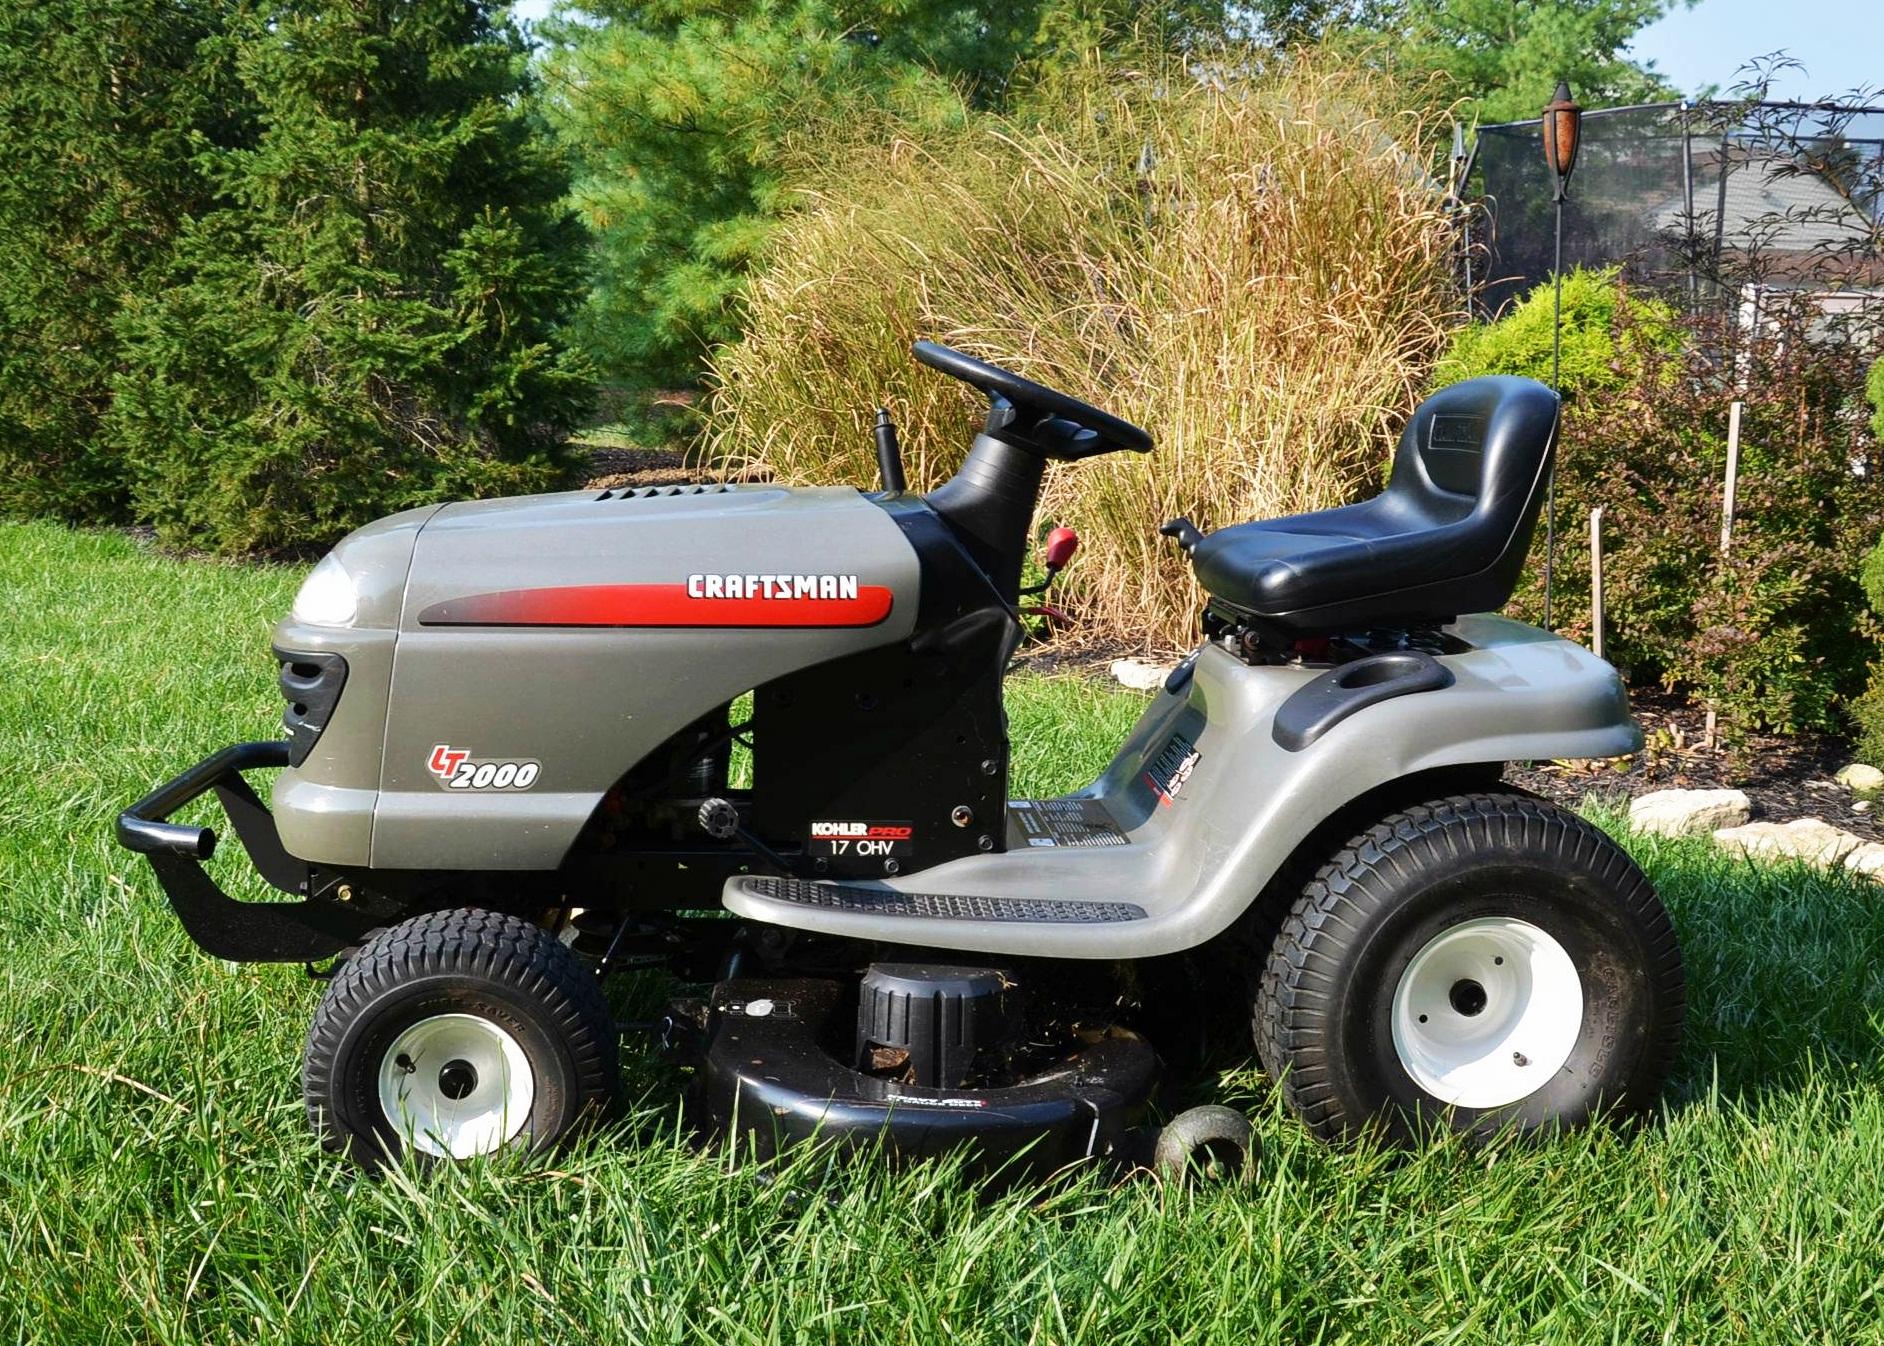 craftsman lawn tractor  model 917 273140   ebth